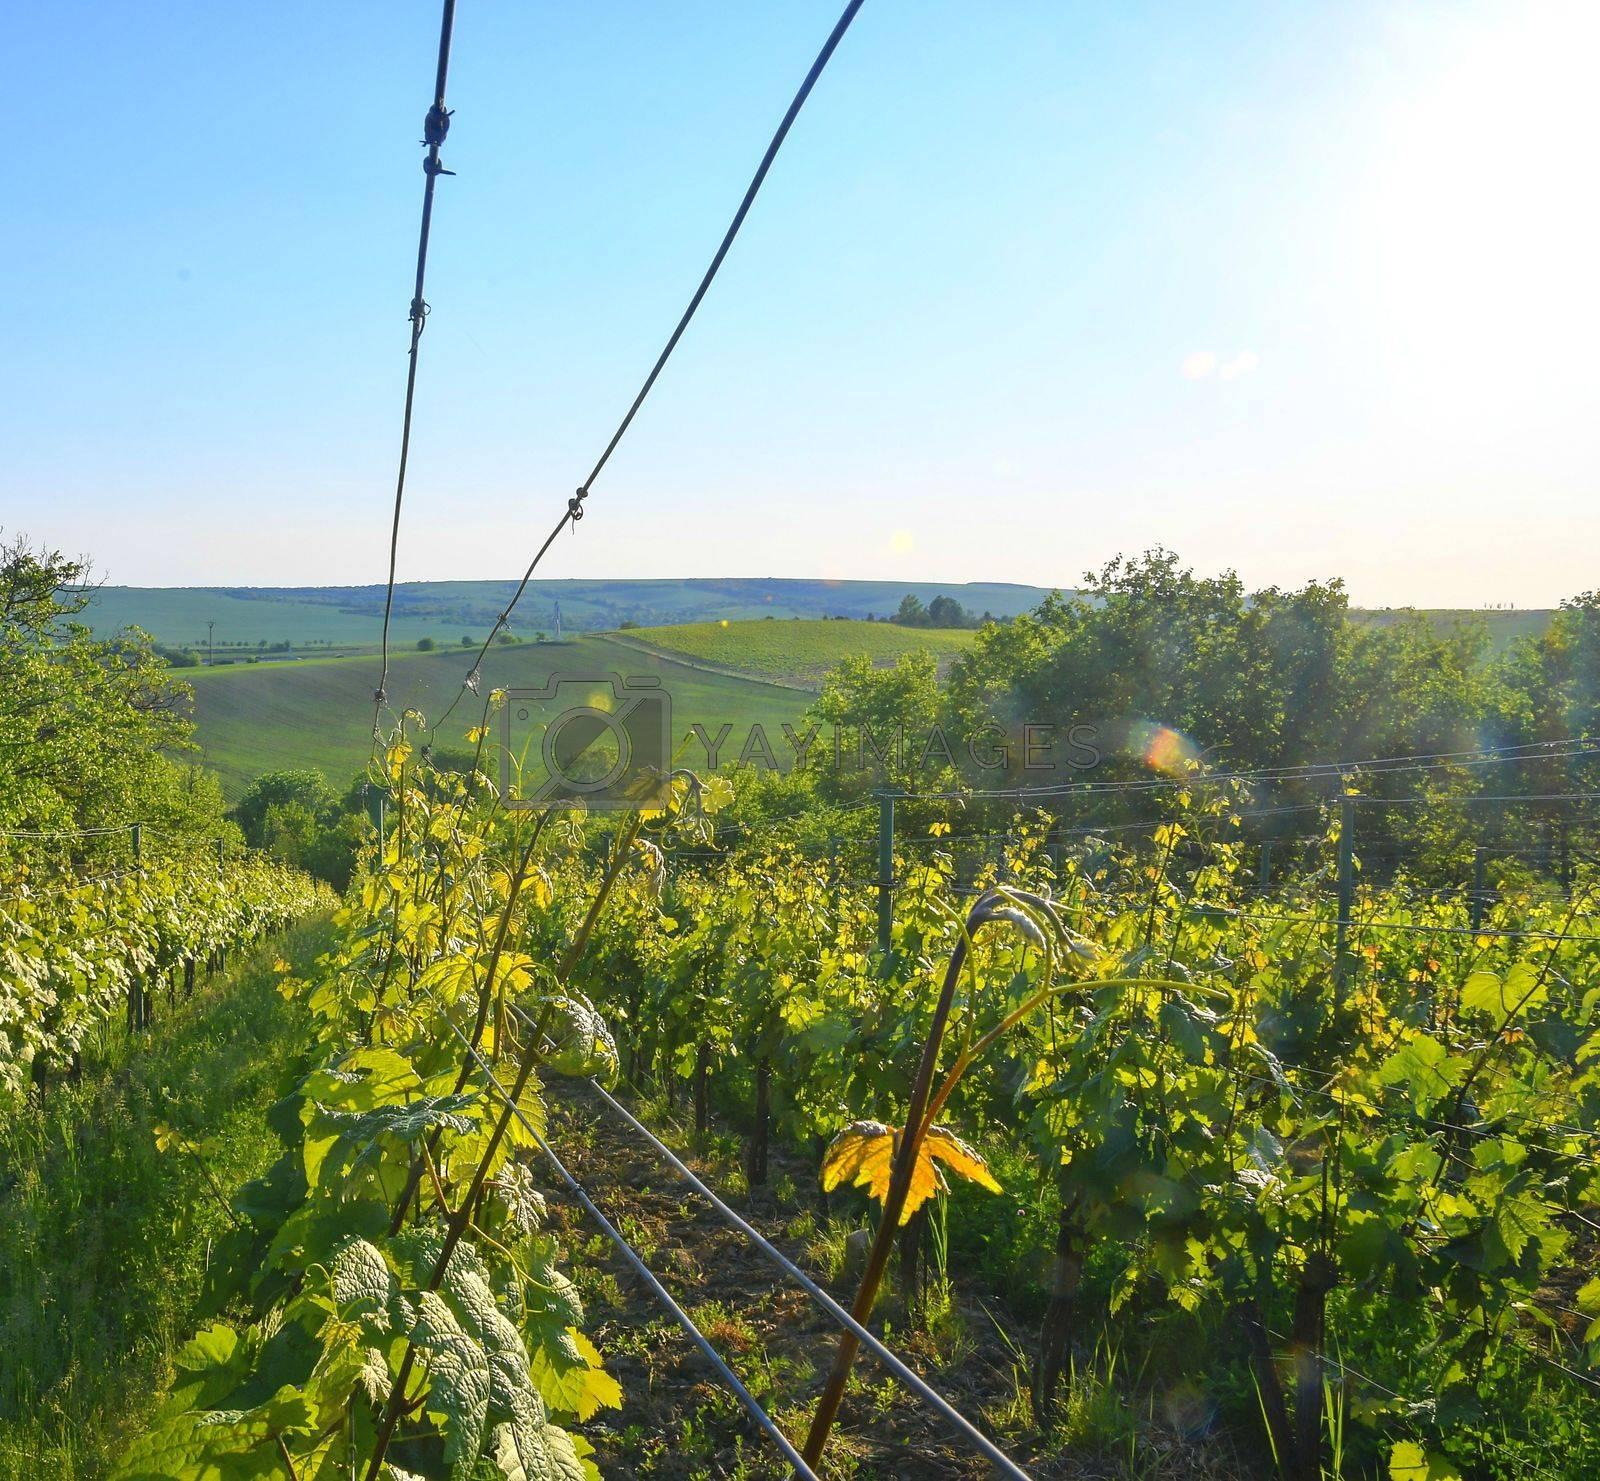 Wineyard at spring.  Sun flare. Vineyard landscape. Vineyard rows at South Moravia, Czech Republic.